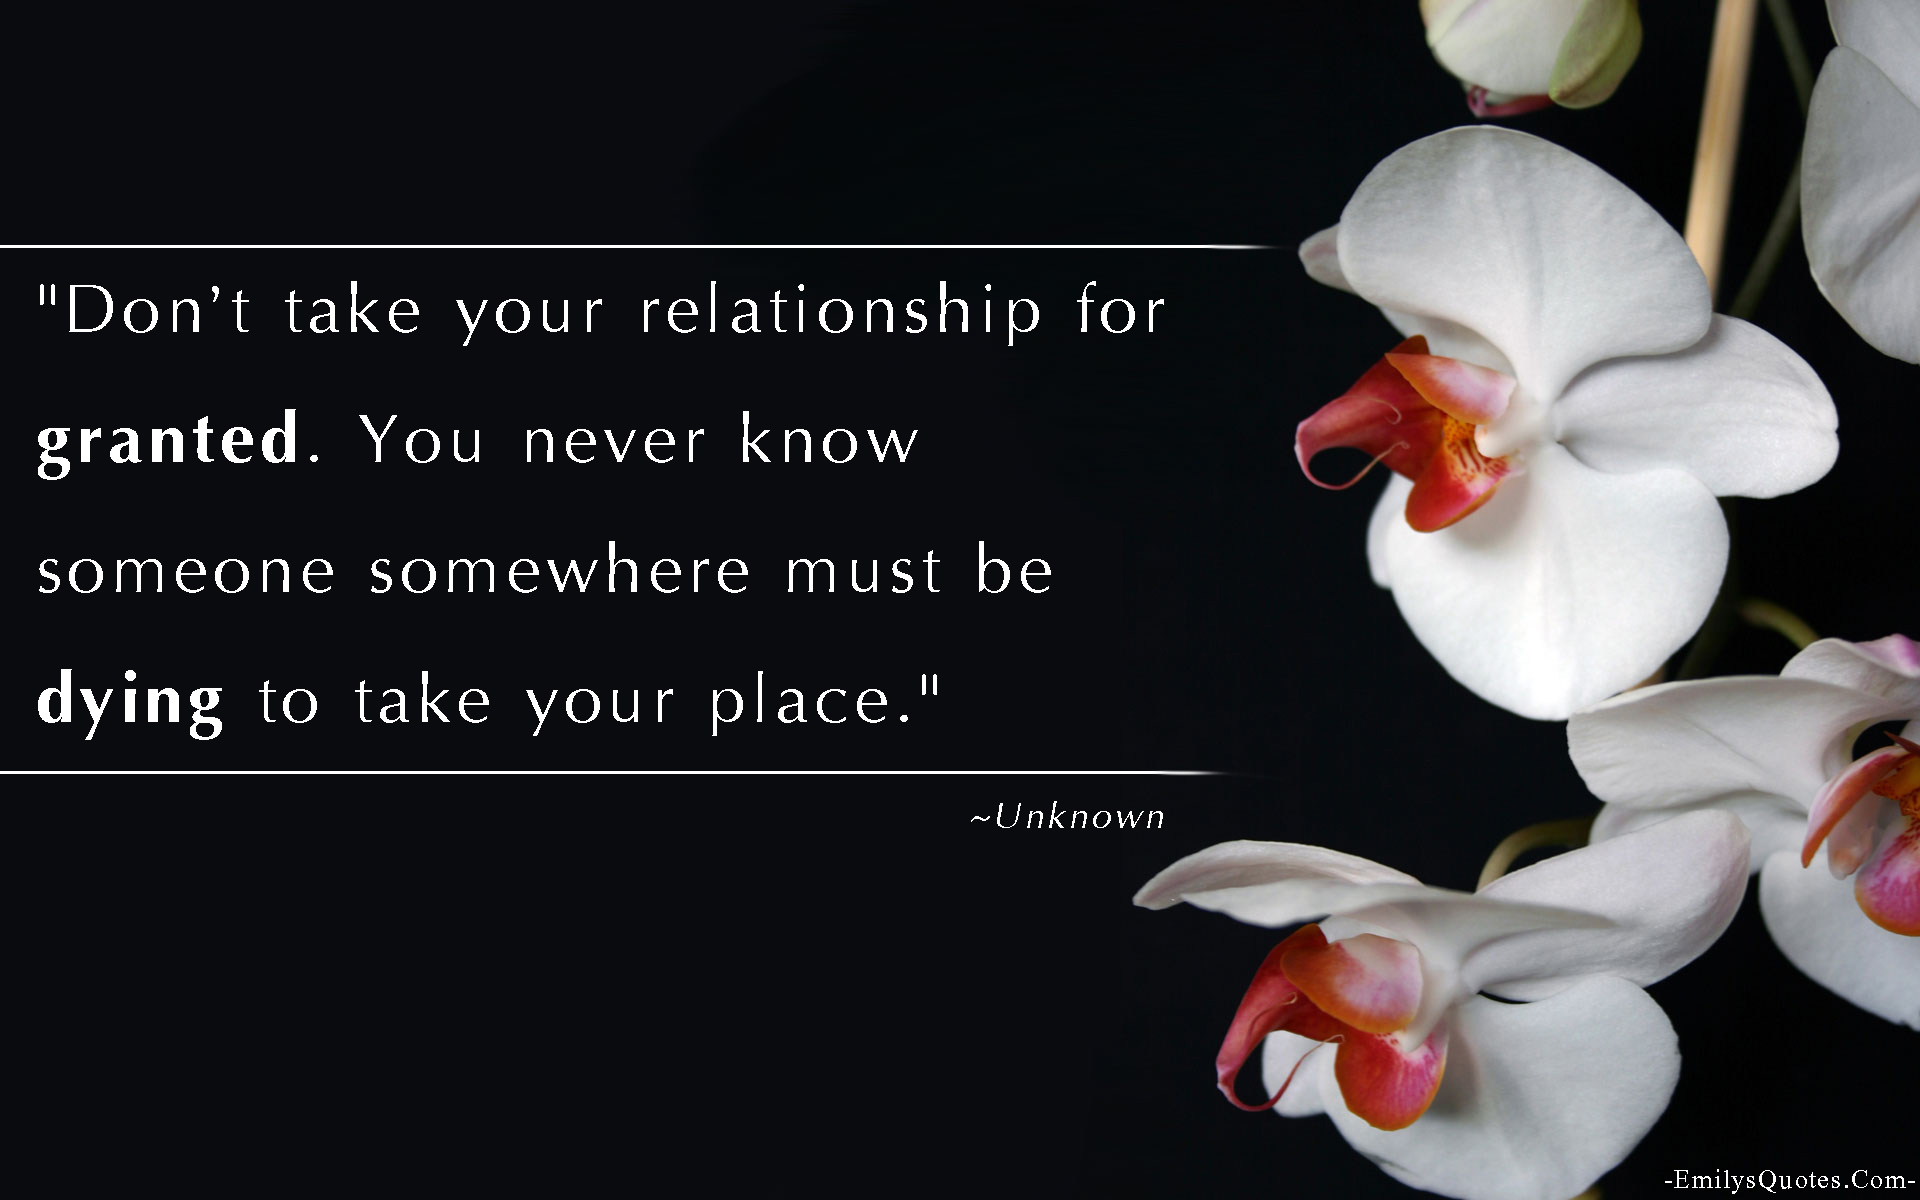 EmilysQuotes.Com - relationship, granted, sad, respect, understanding, unknown